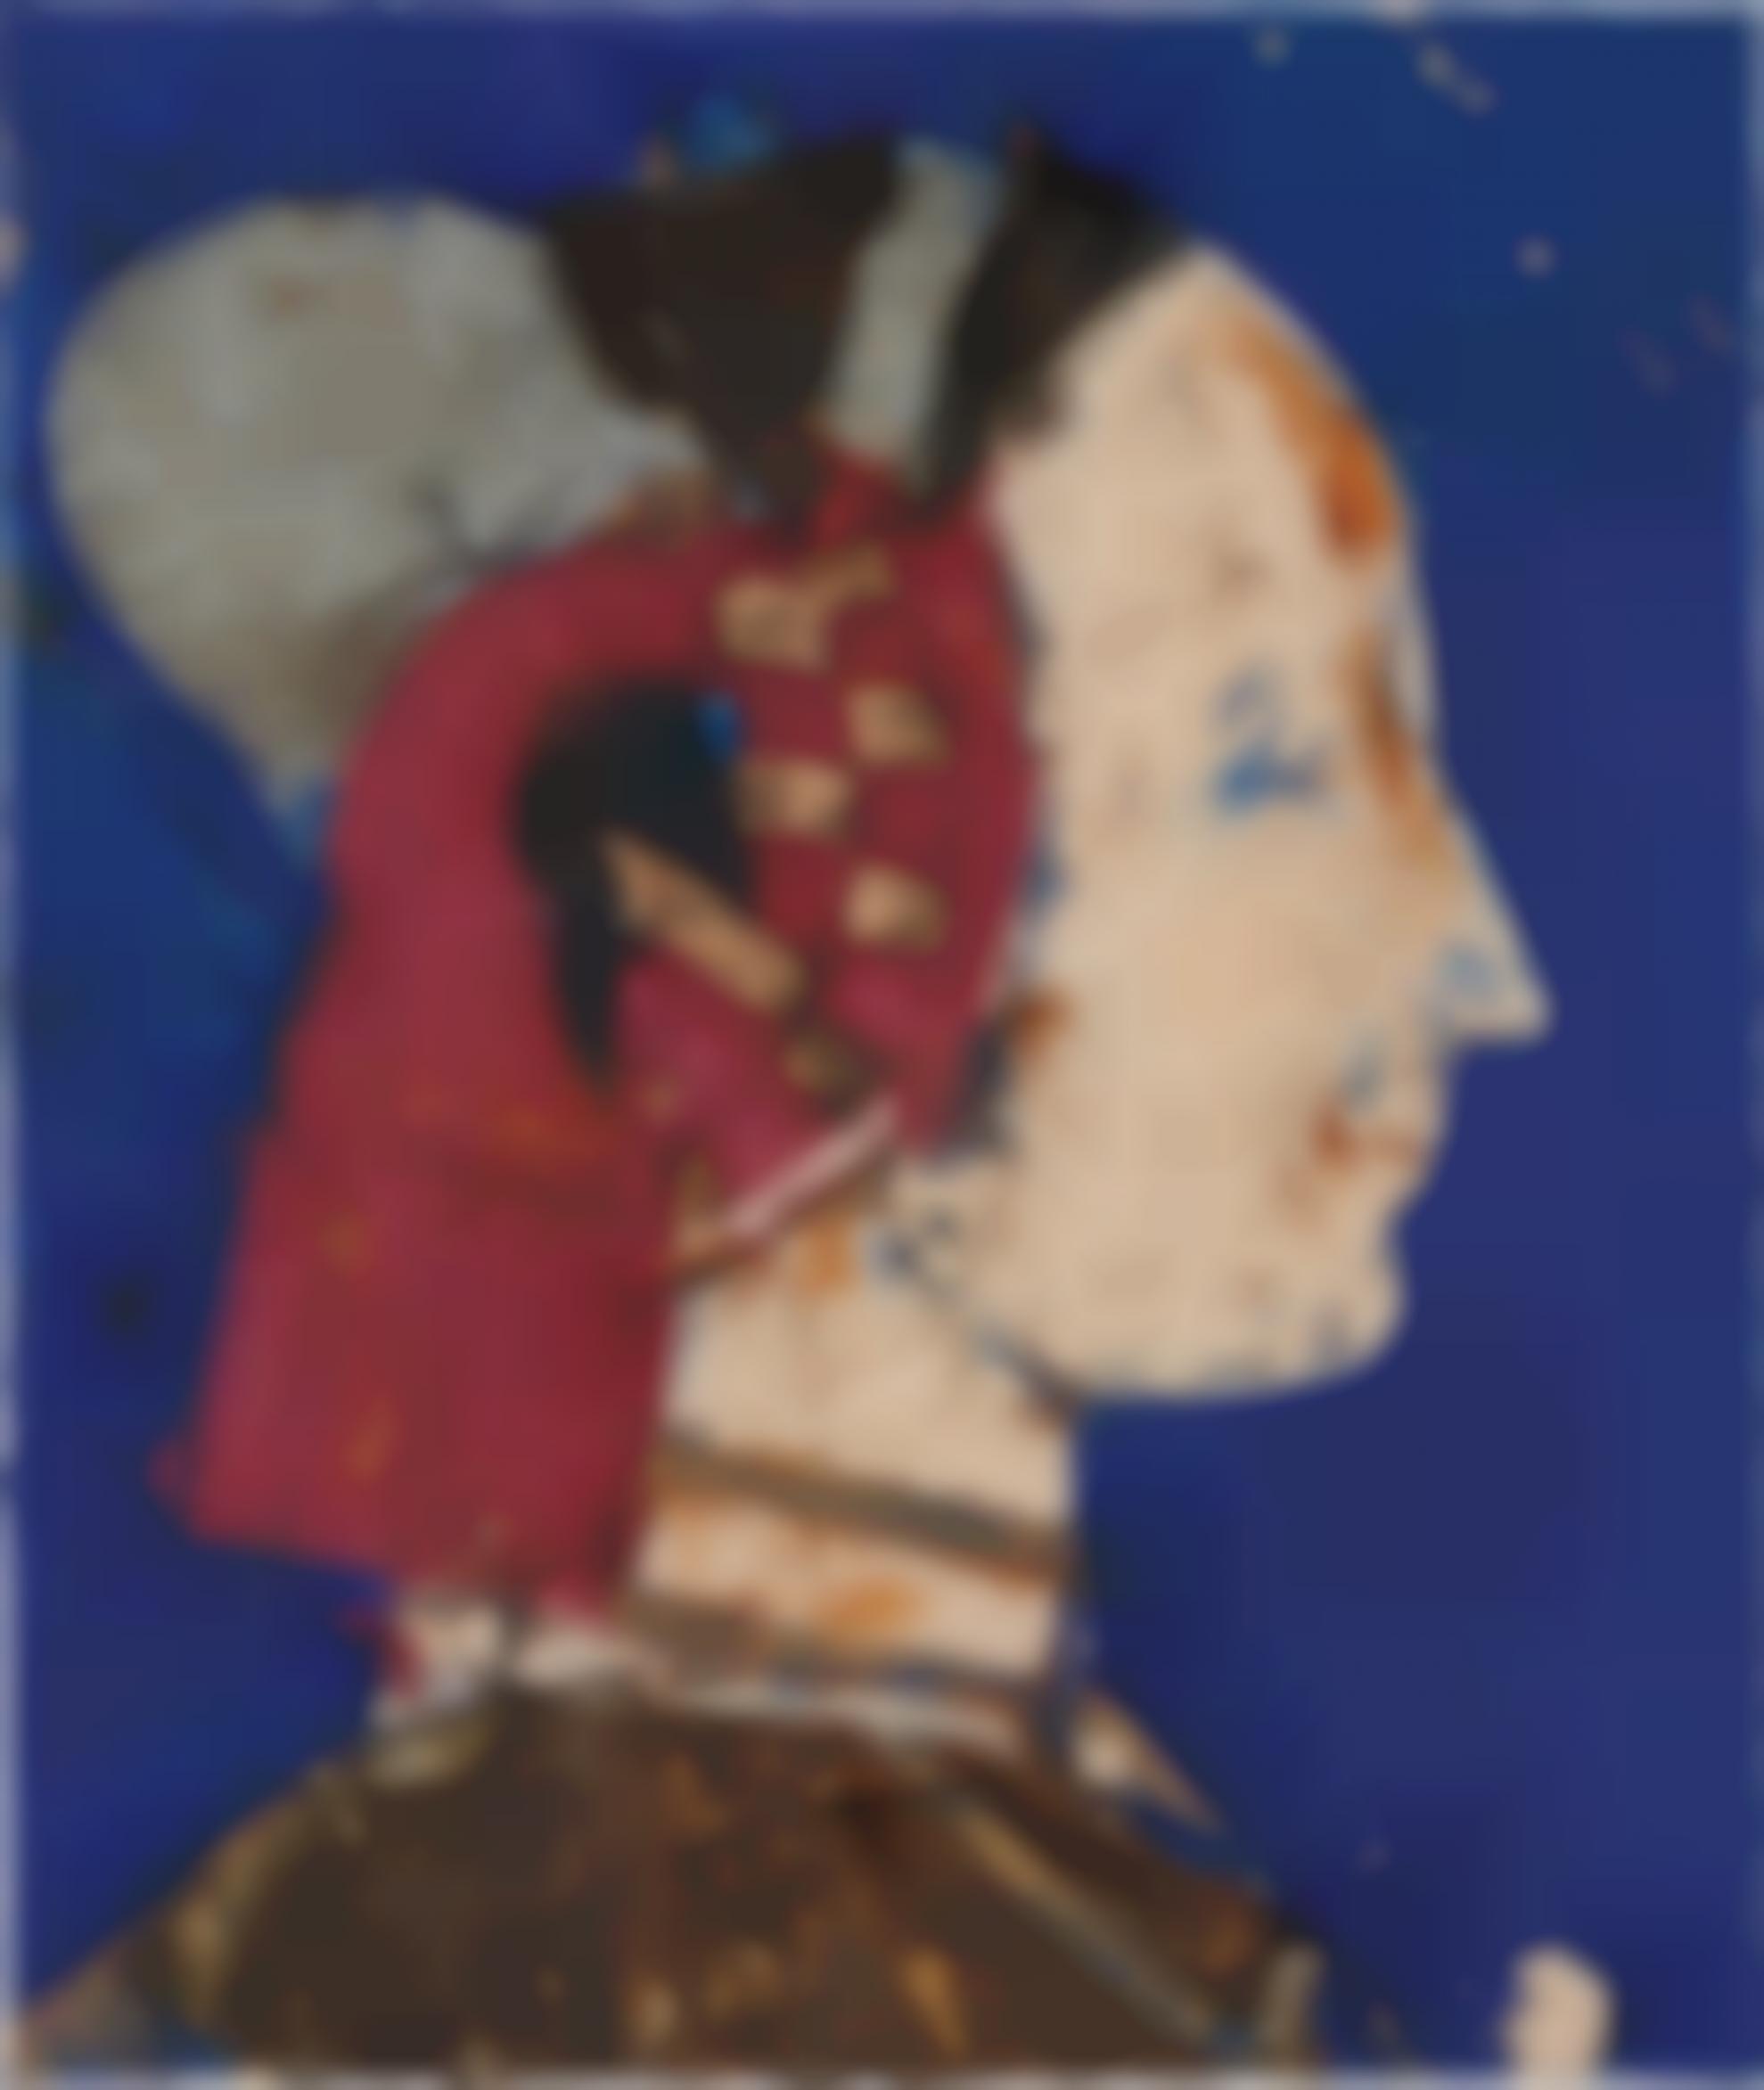 Manolo Valdes-Perfil Con Fondo Azul-1994